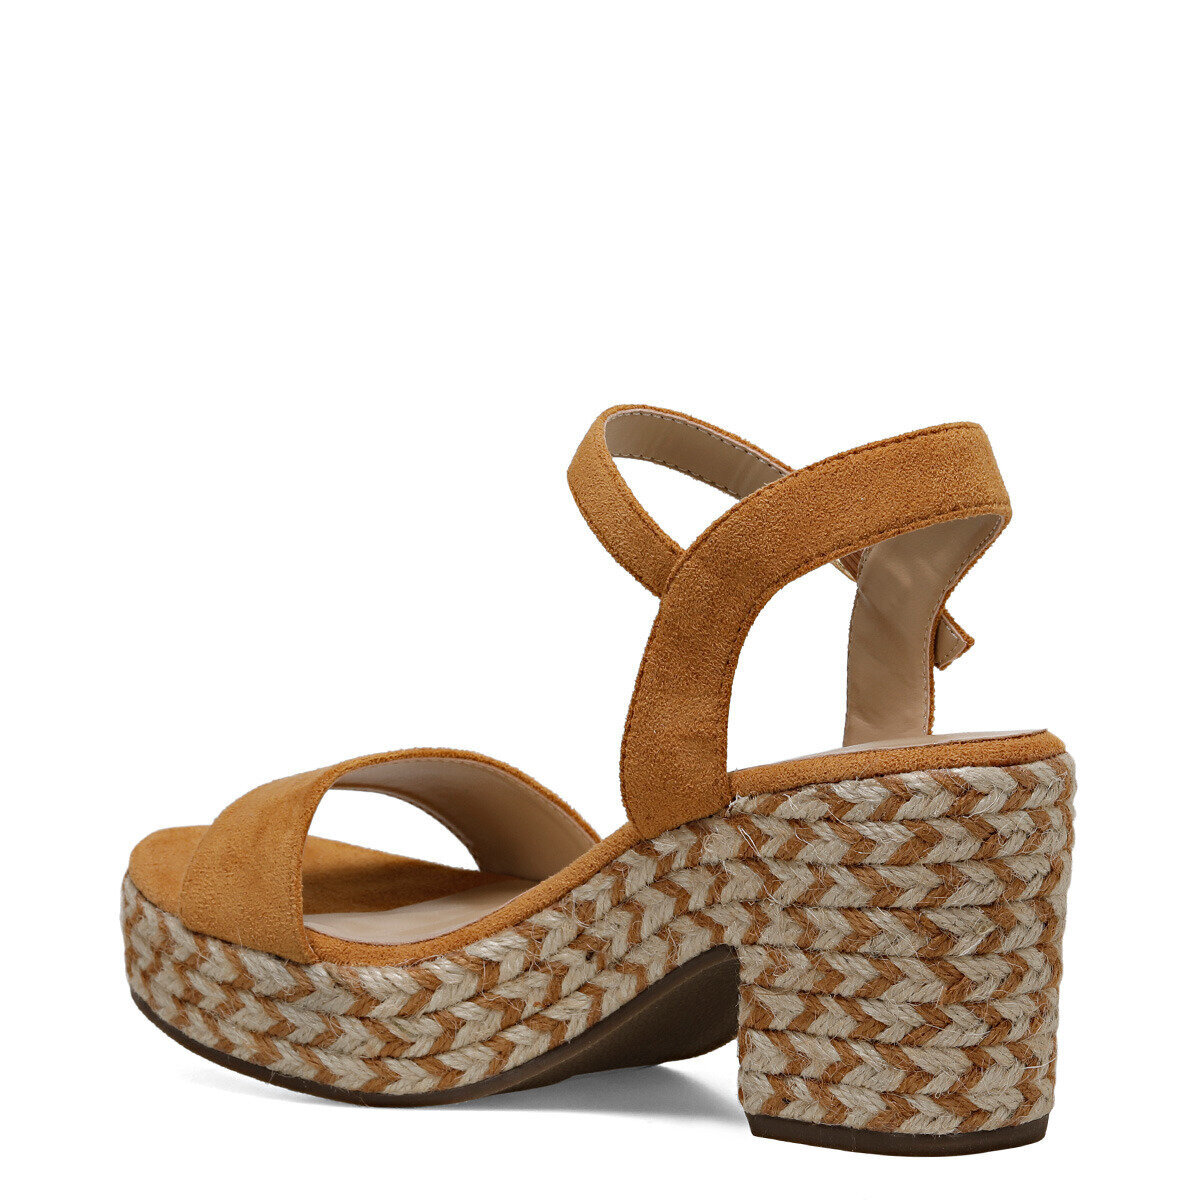 NORINA Camel Kadın Topuklu Sandalet